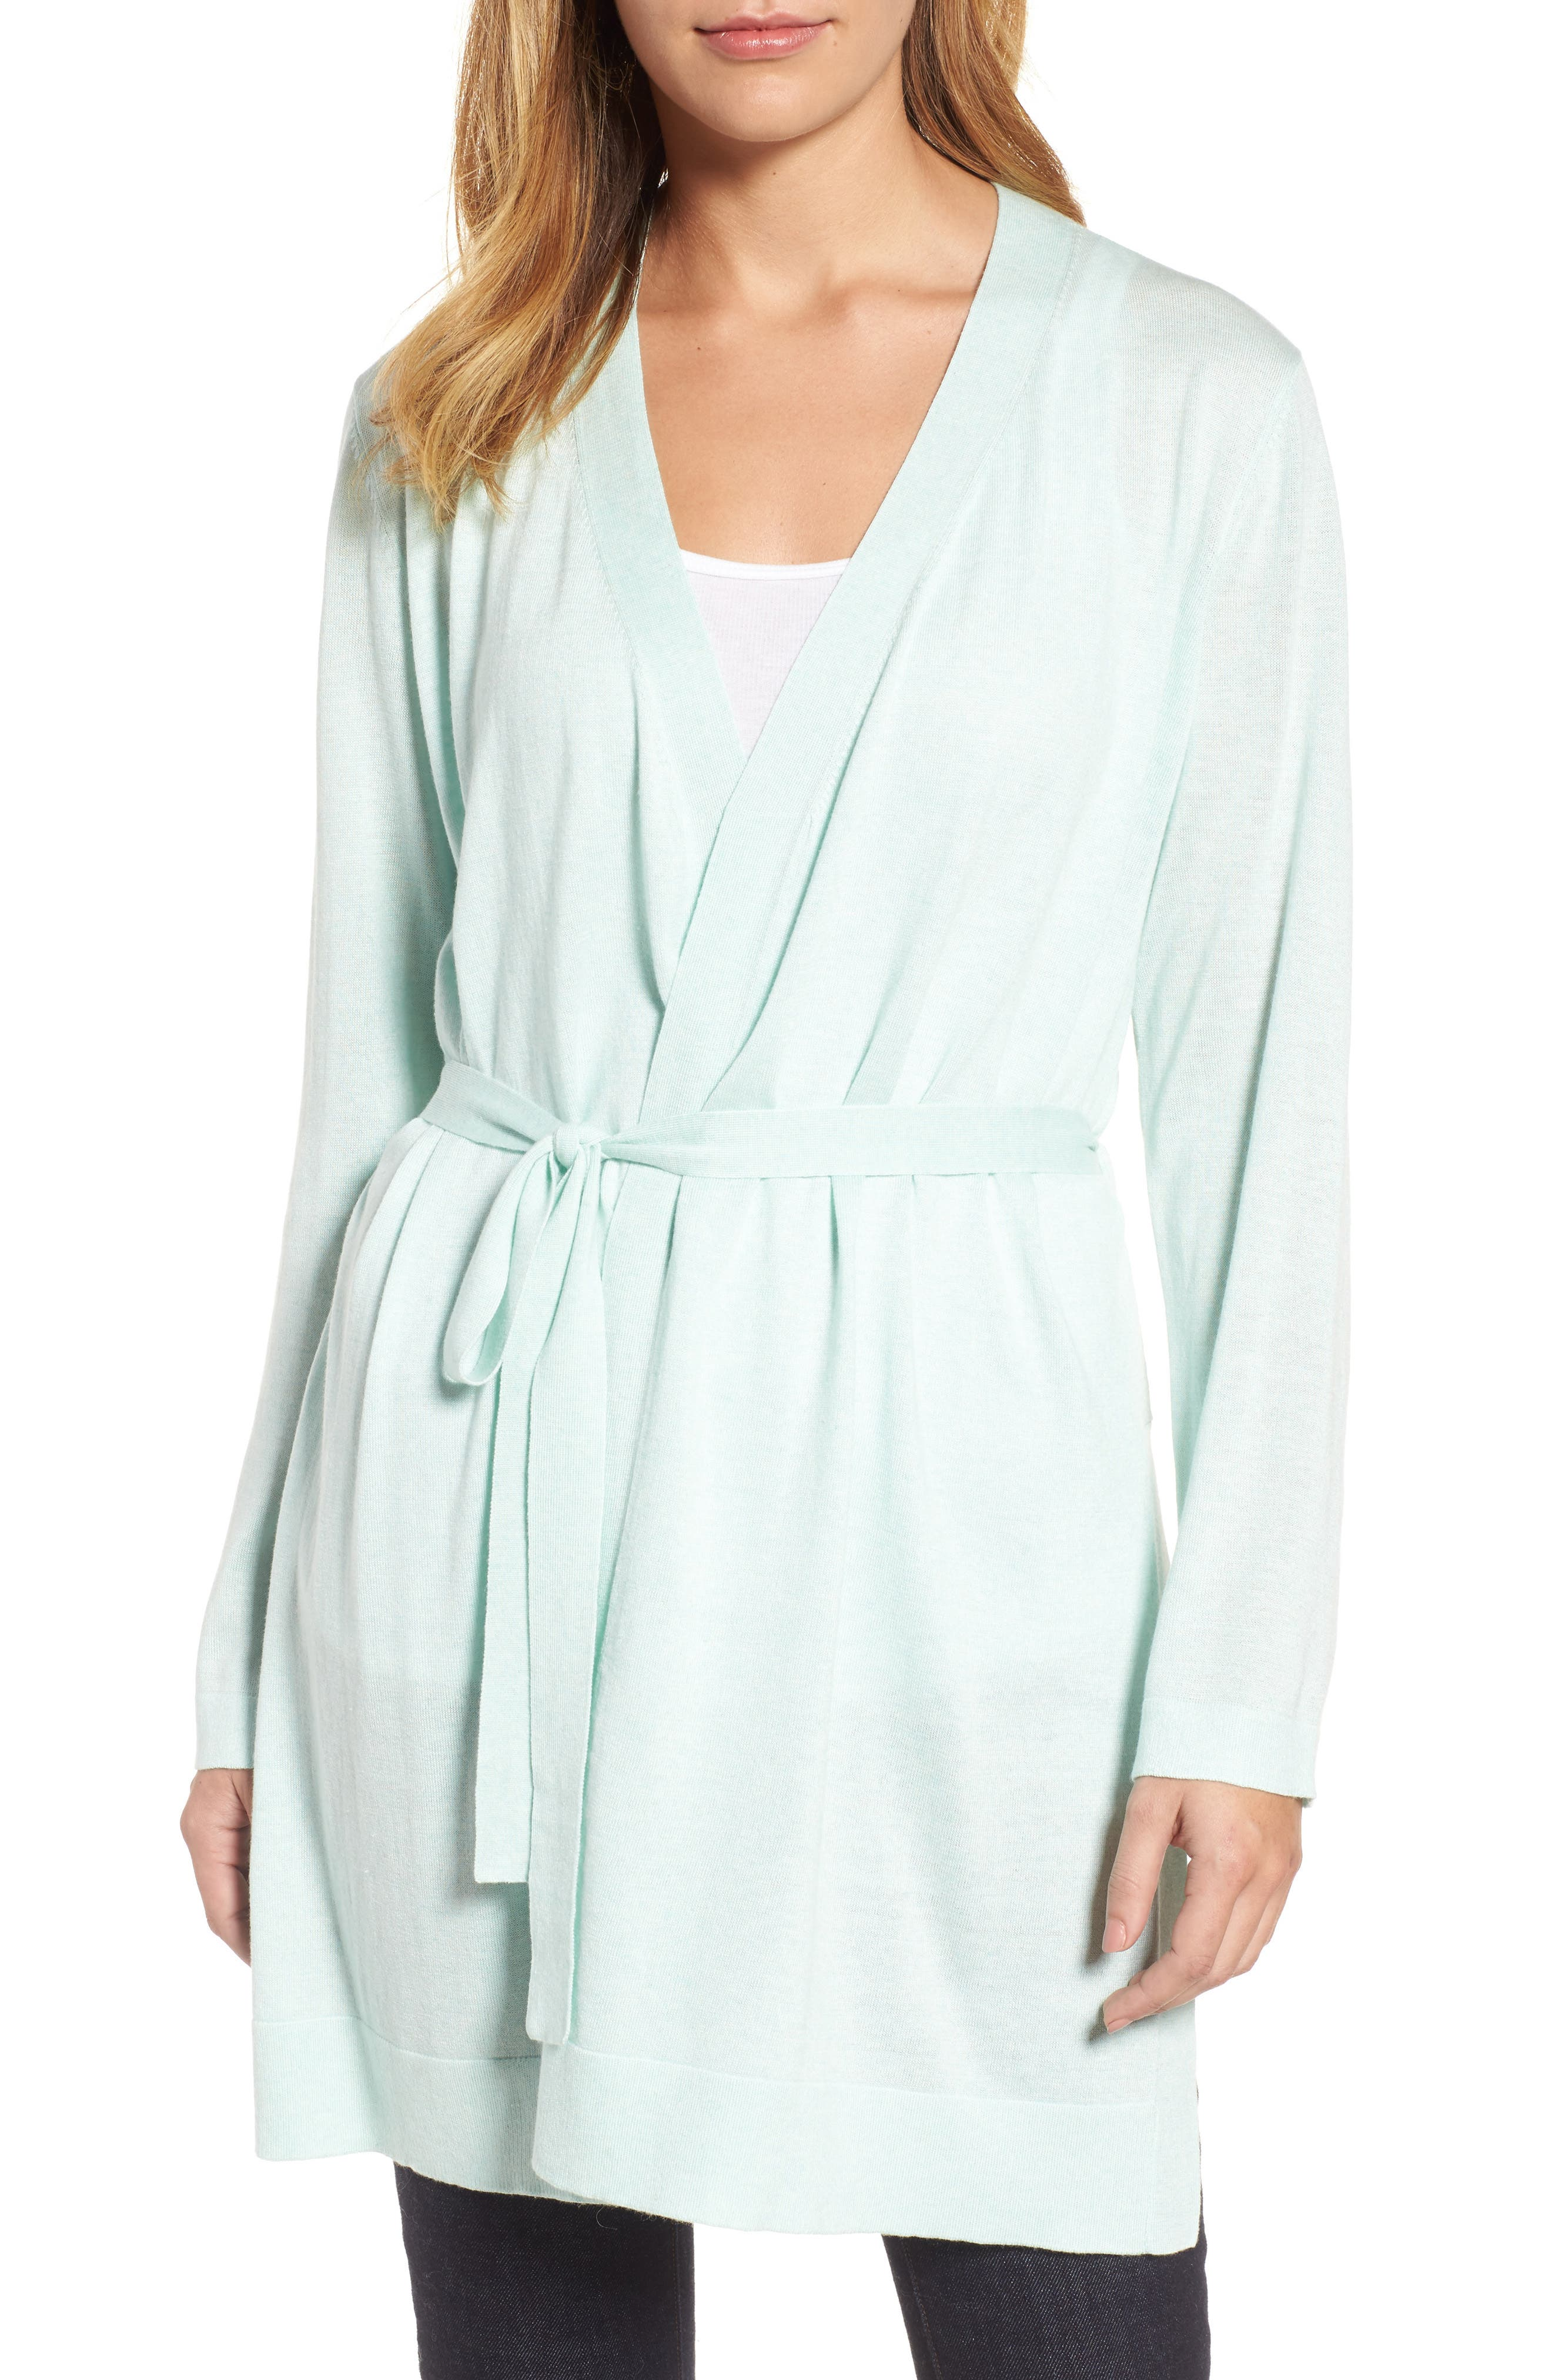 Main Image - Eileen Fisher Tie Waist Tencel® Blend Cardigan (Regular & Petite)